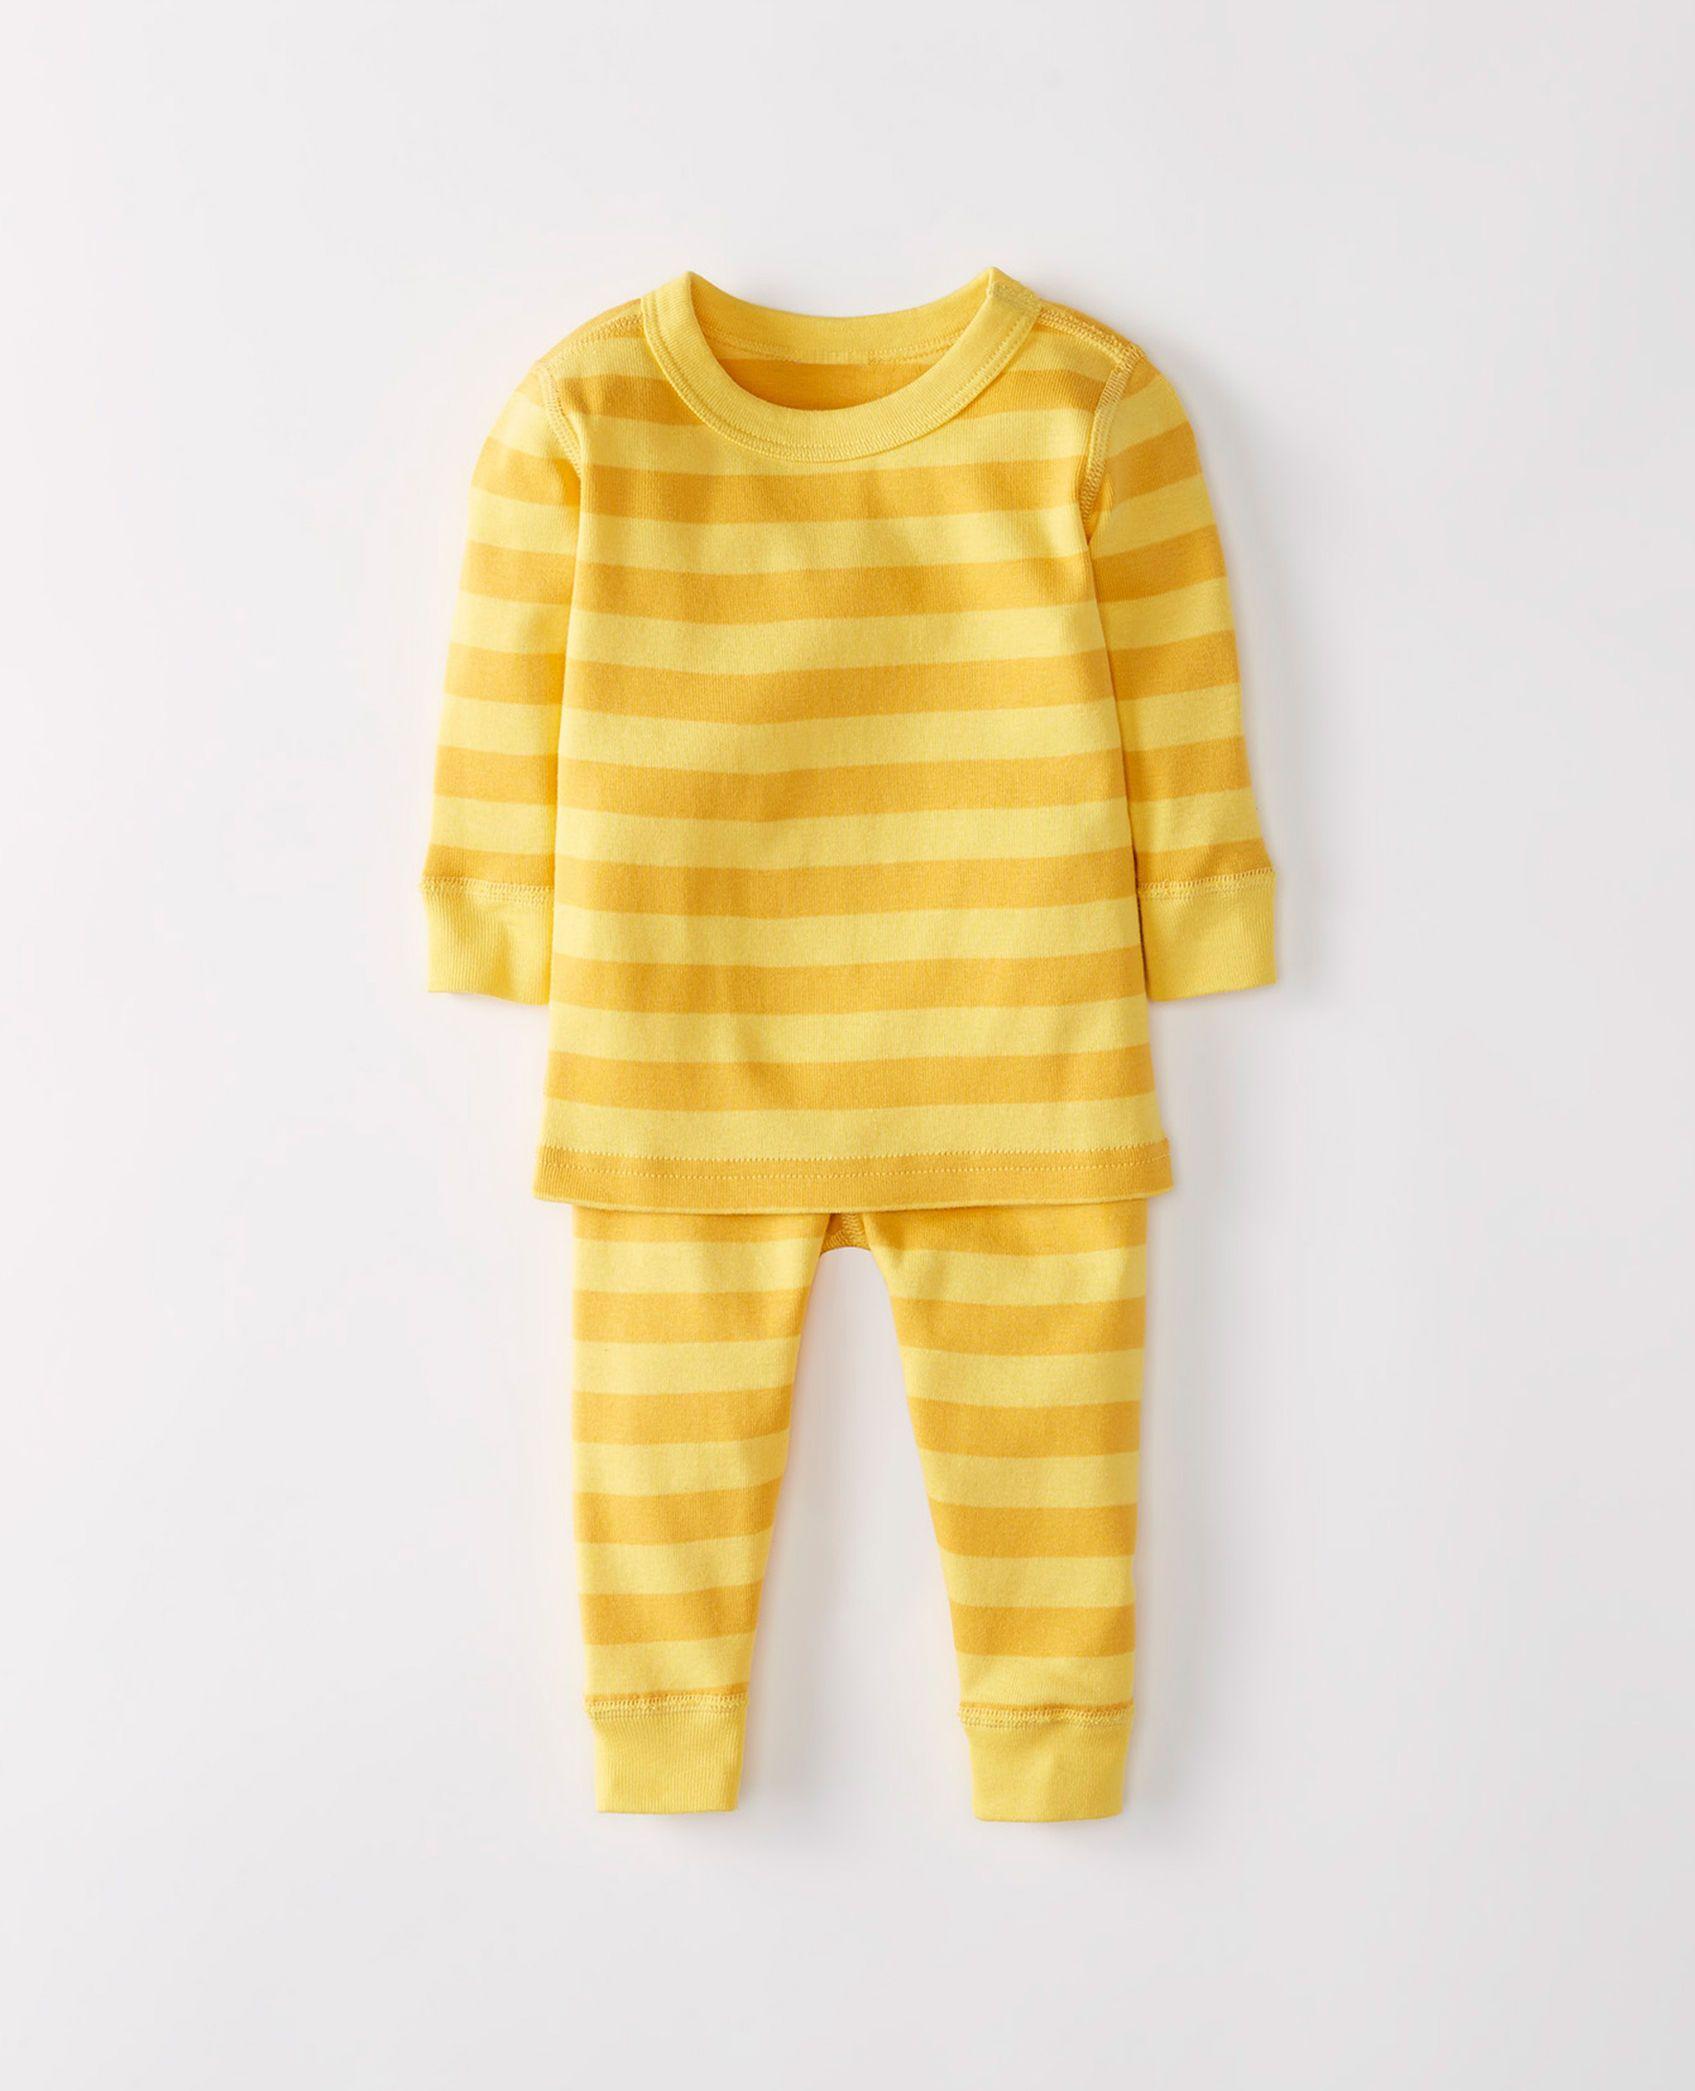 Long John Pajamas In Organic Cotton in Swedish Yellow Turning Leaf